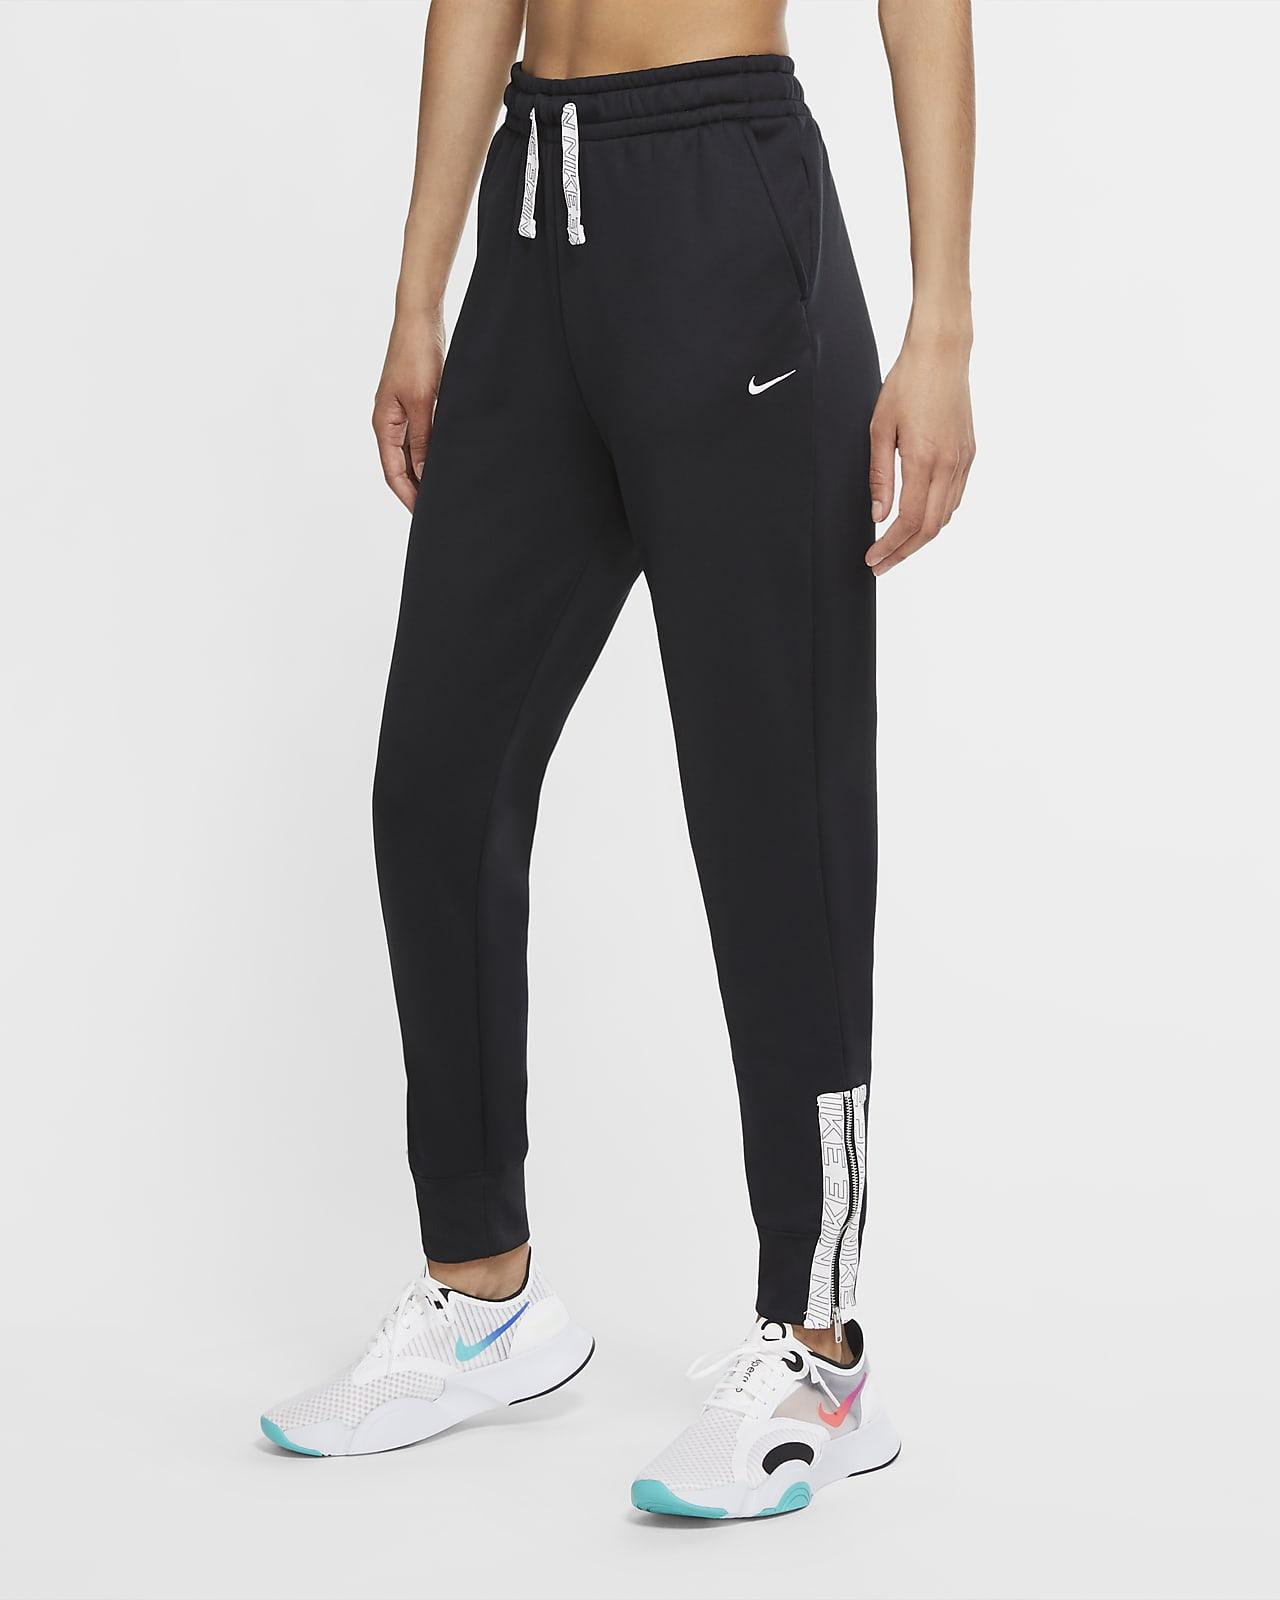 Pantalon de training Nike Therma pour Femme